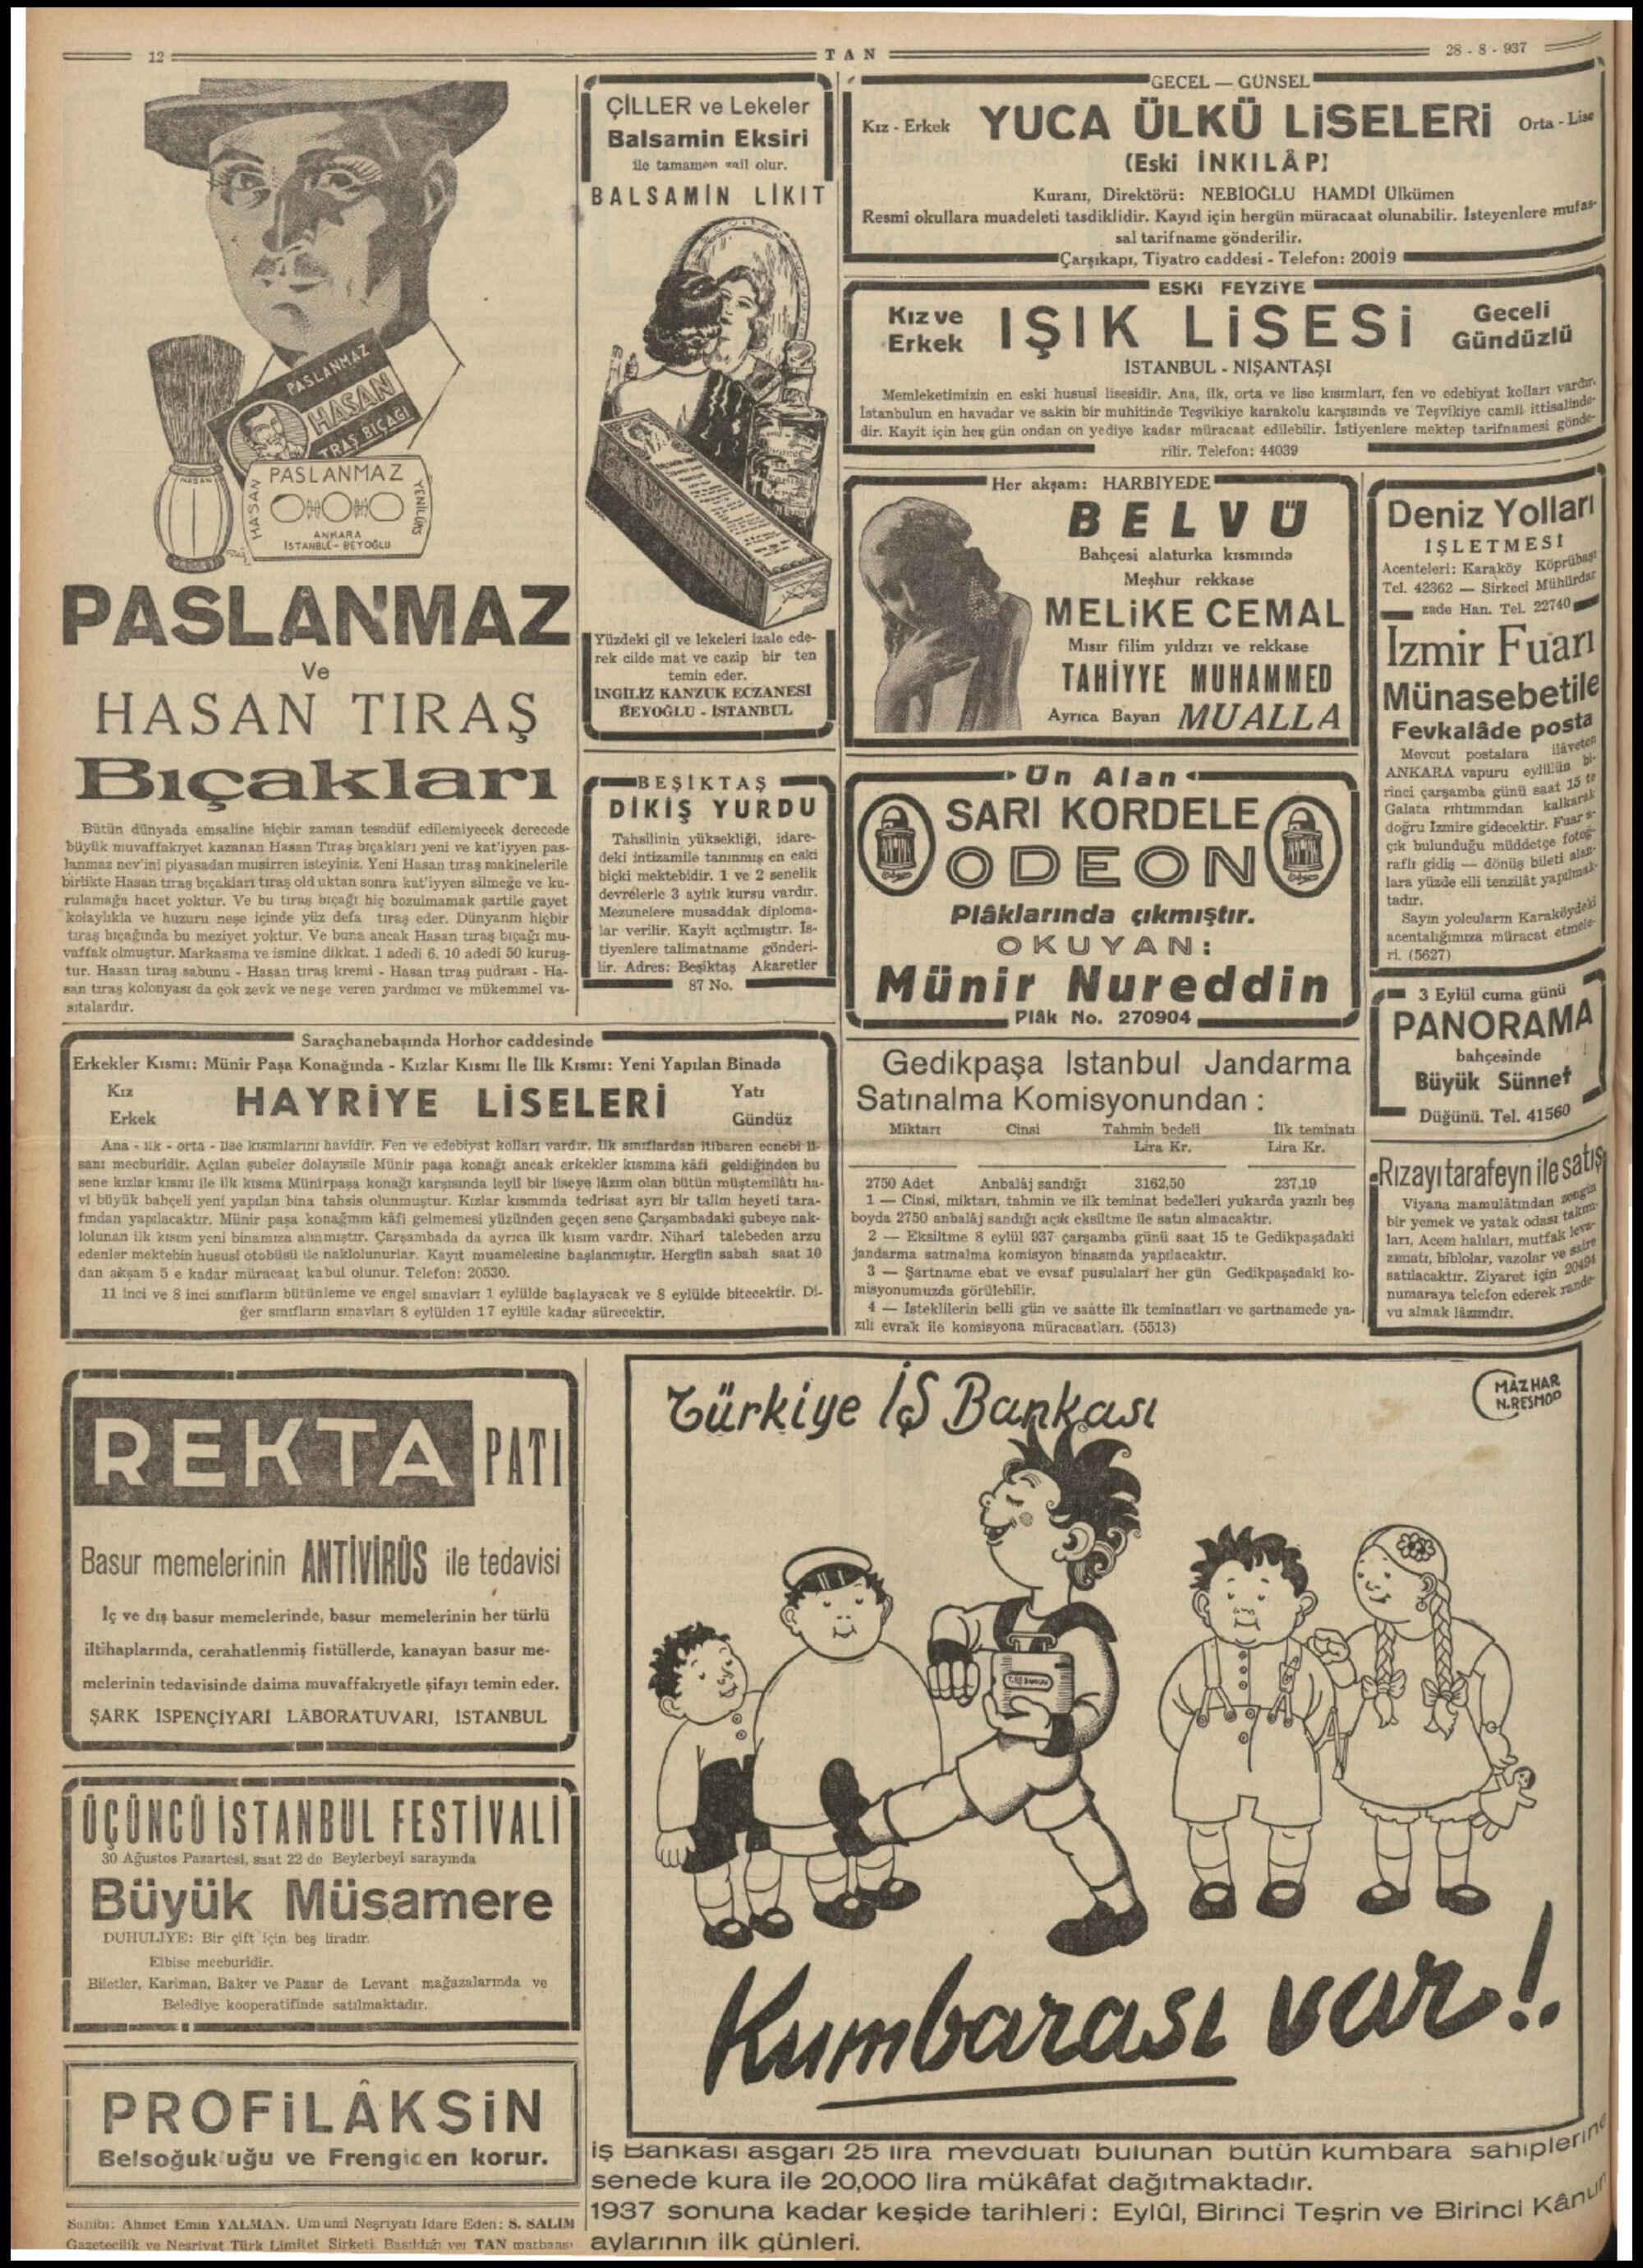 28 Ağustos 1937 Tarihli Tan Dergisi Sayfa 12